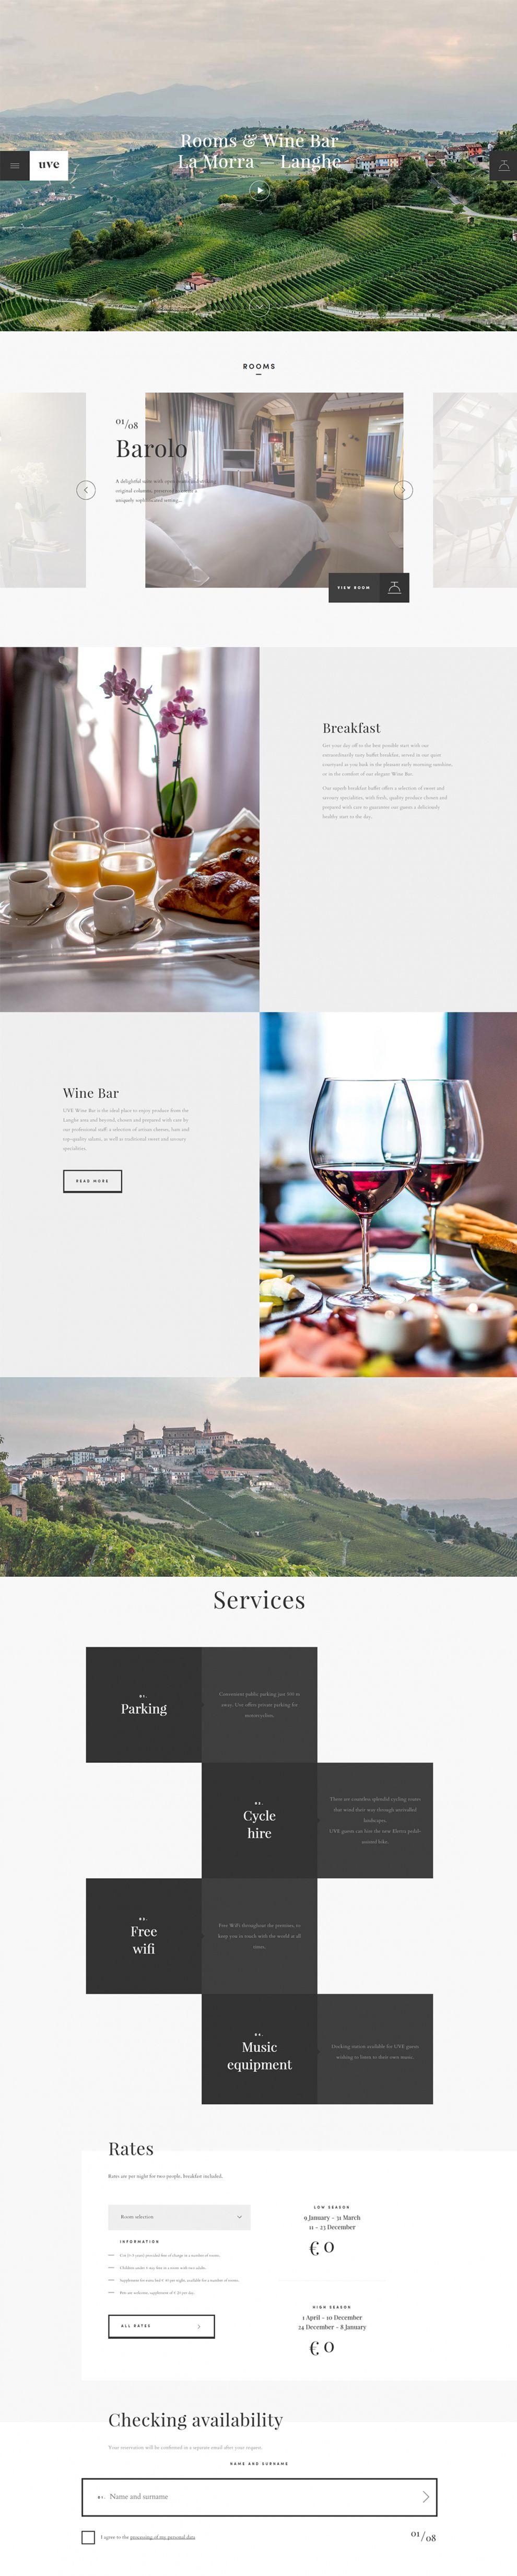 UVE - Rooms & Wine bar Great Homepage